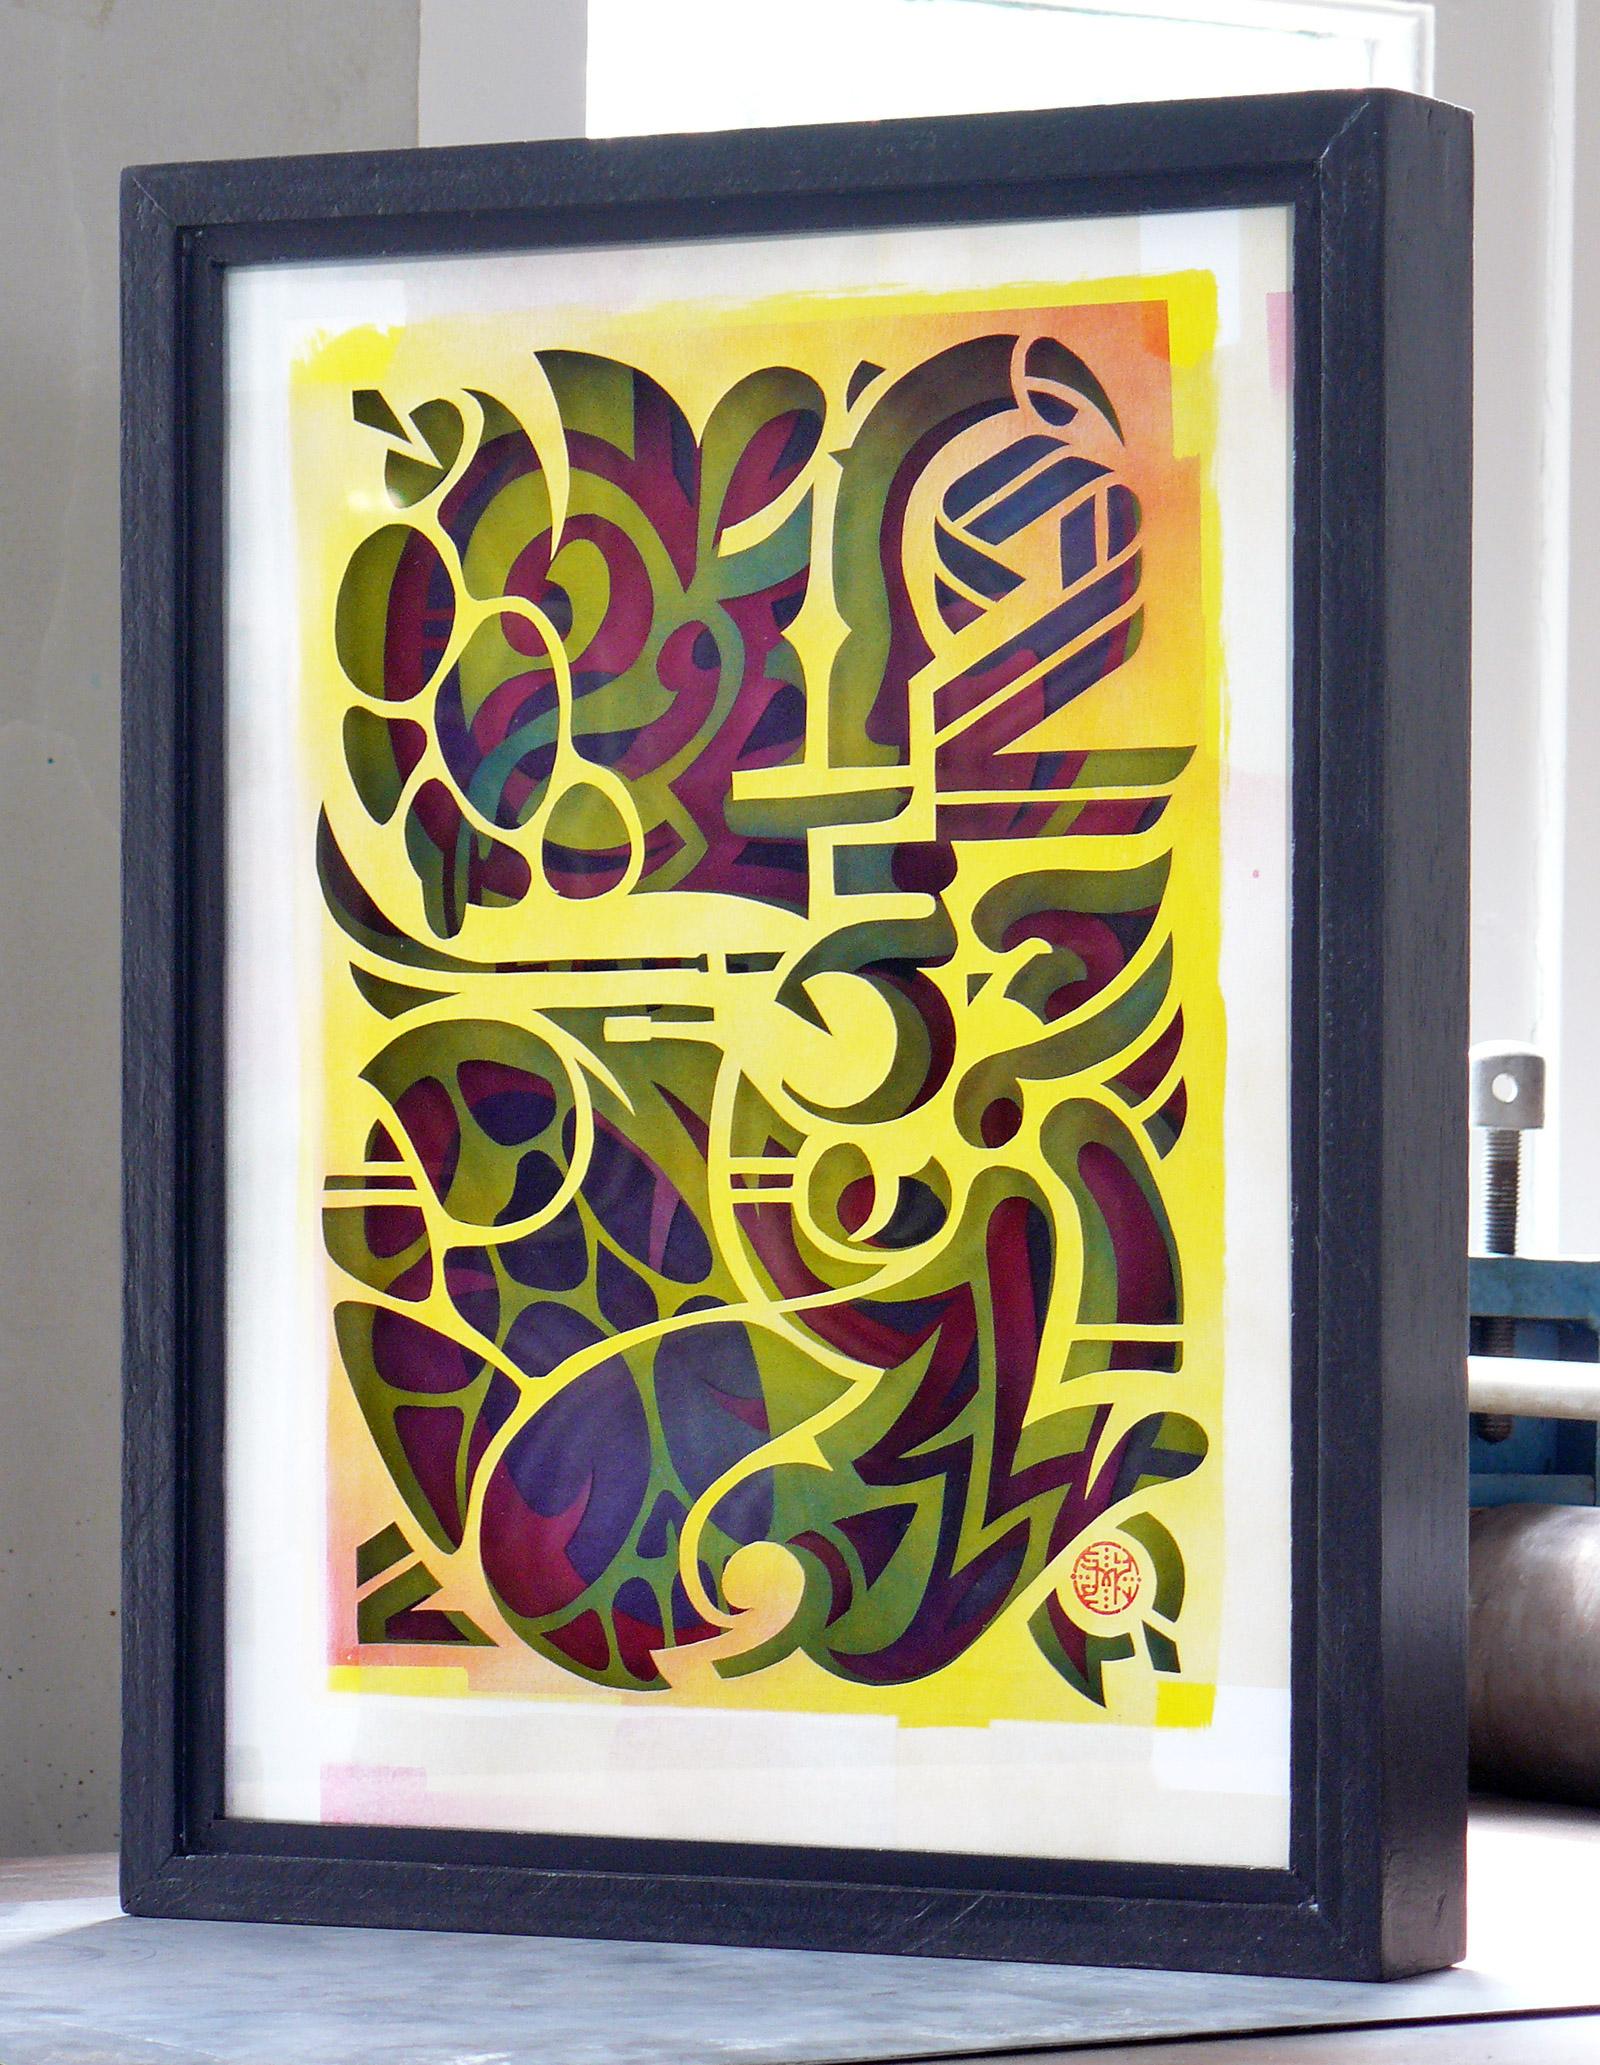 valutagrafie, monetizing art, typography, artwork, layers, paper art, visual art